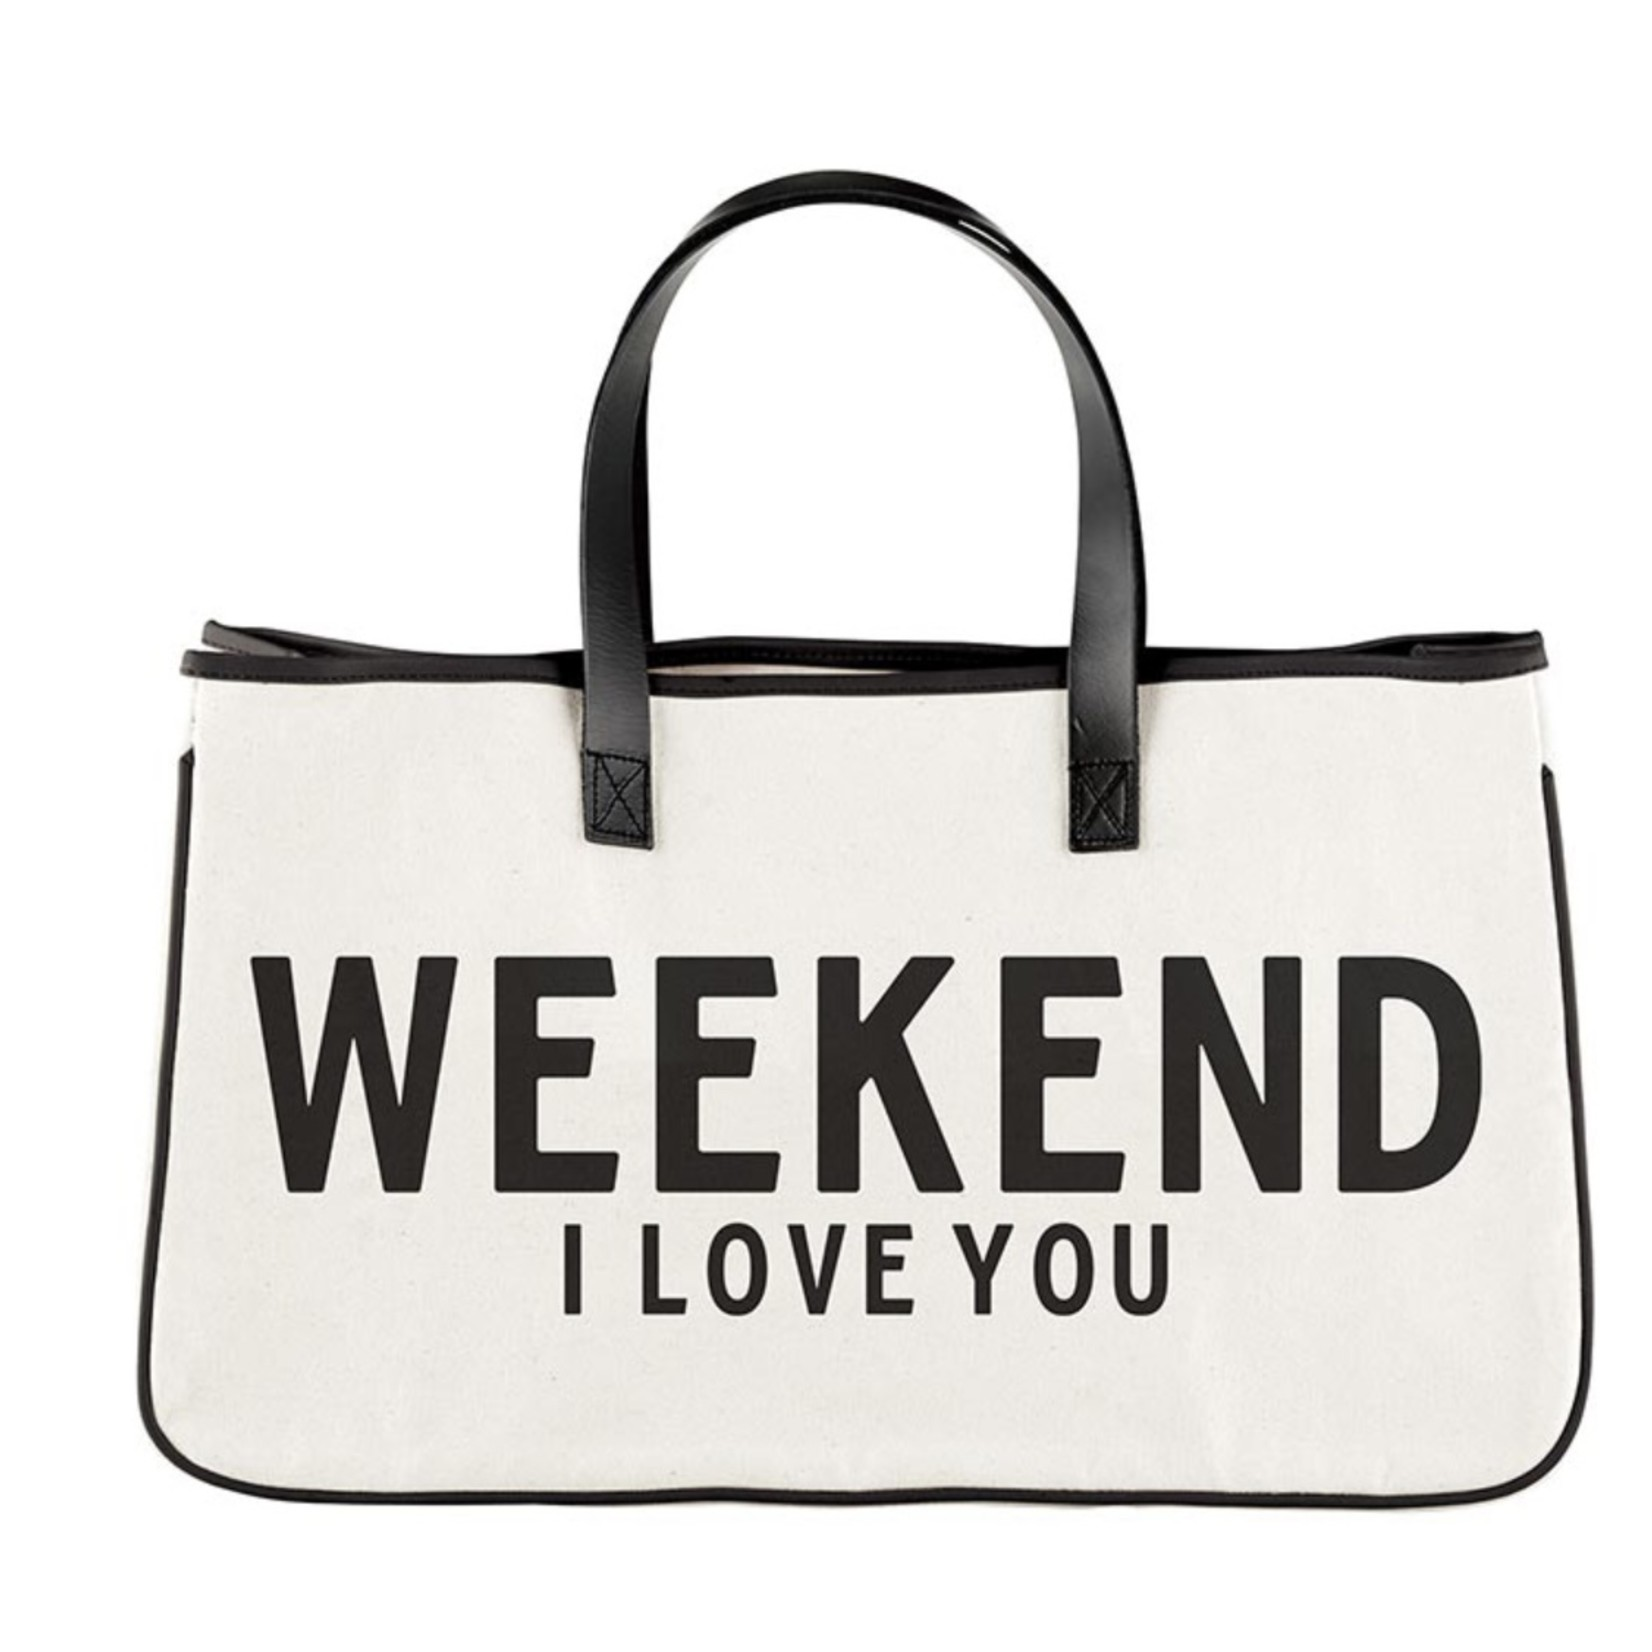 Santa Barbara Designs Canvas Tote - Weekend I Love You